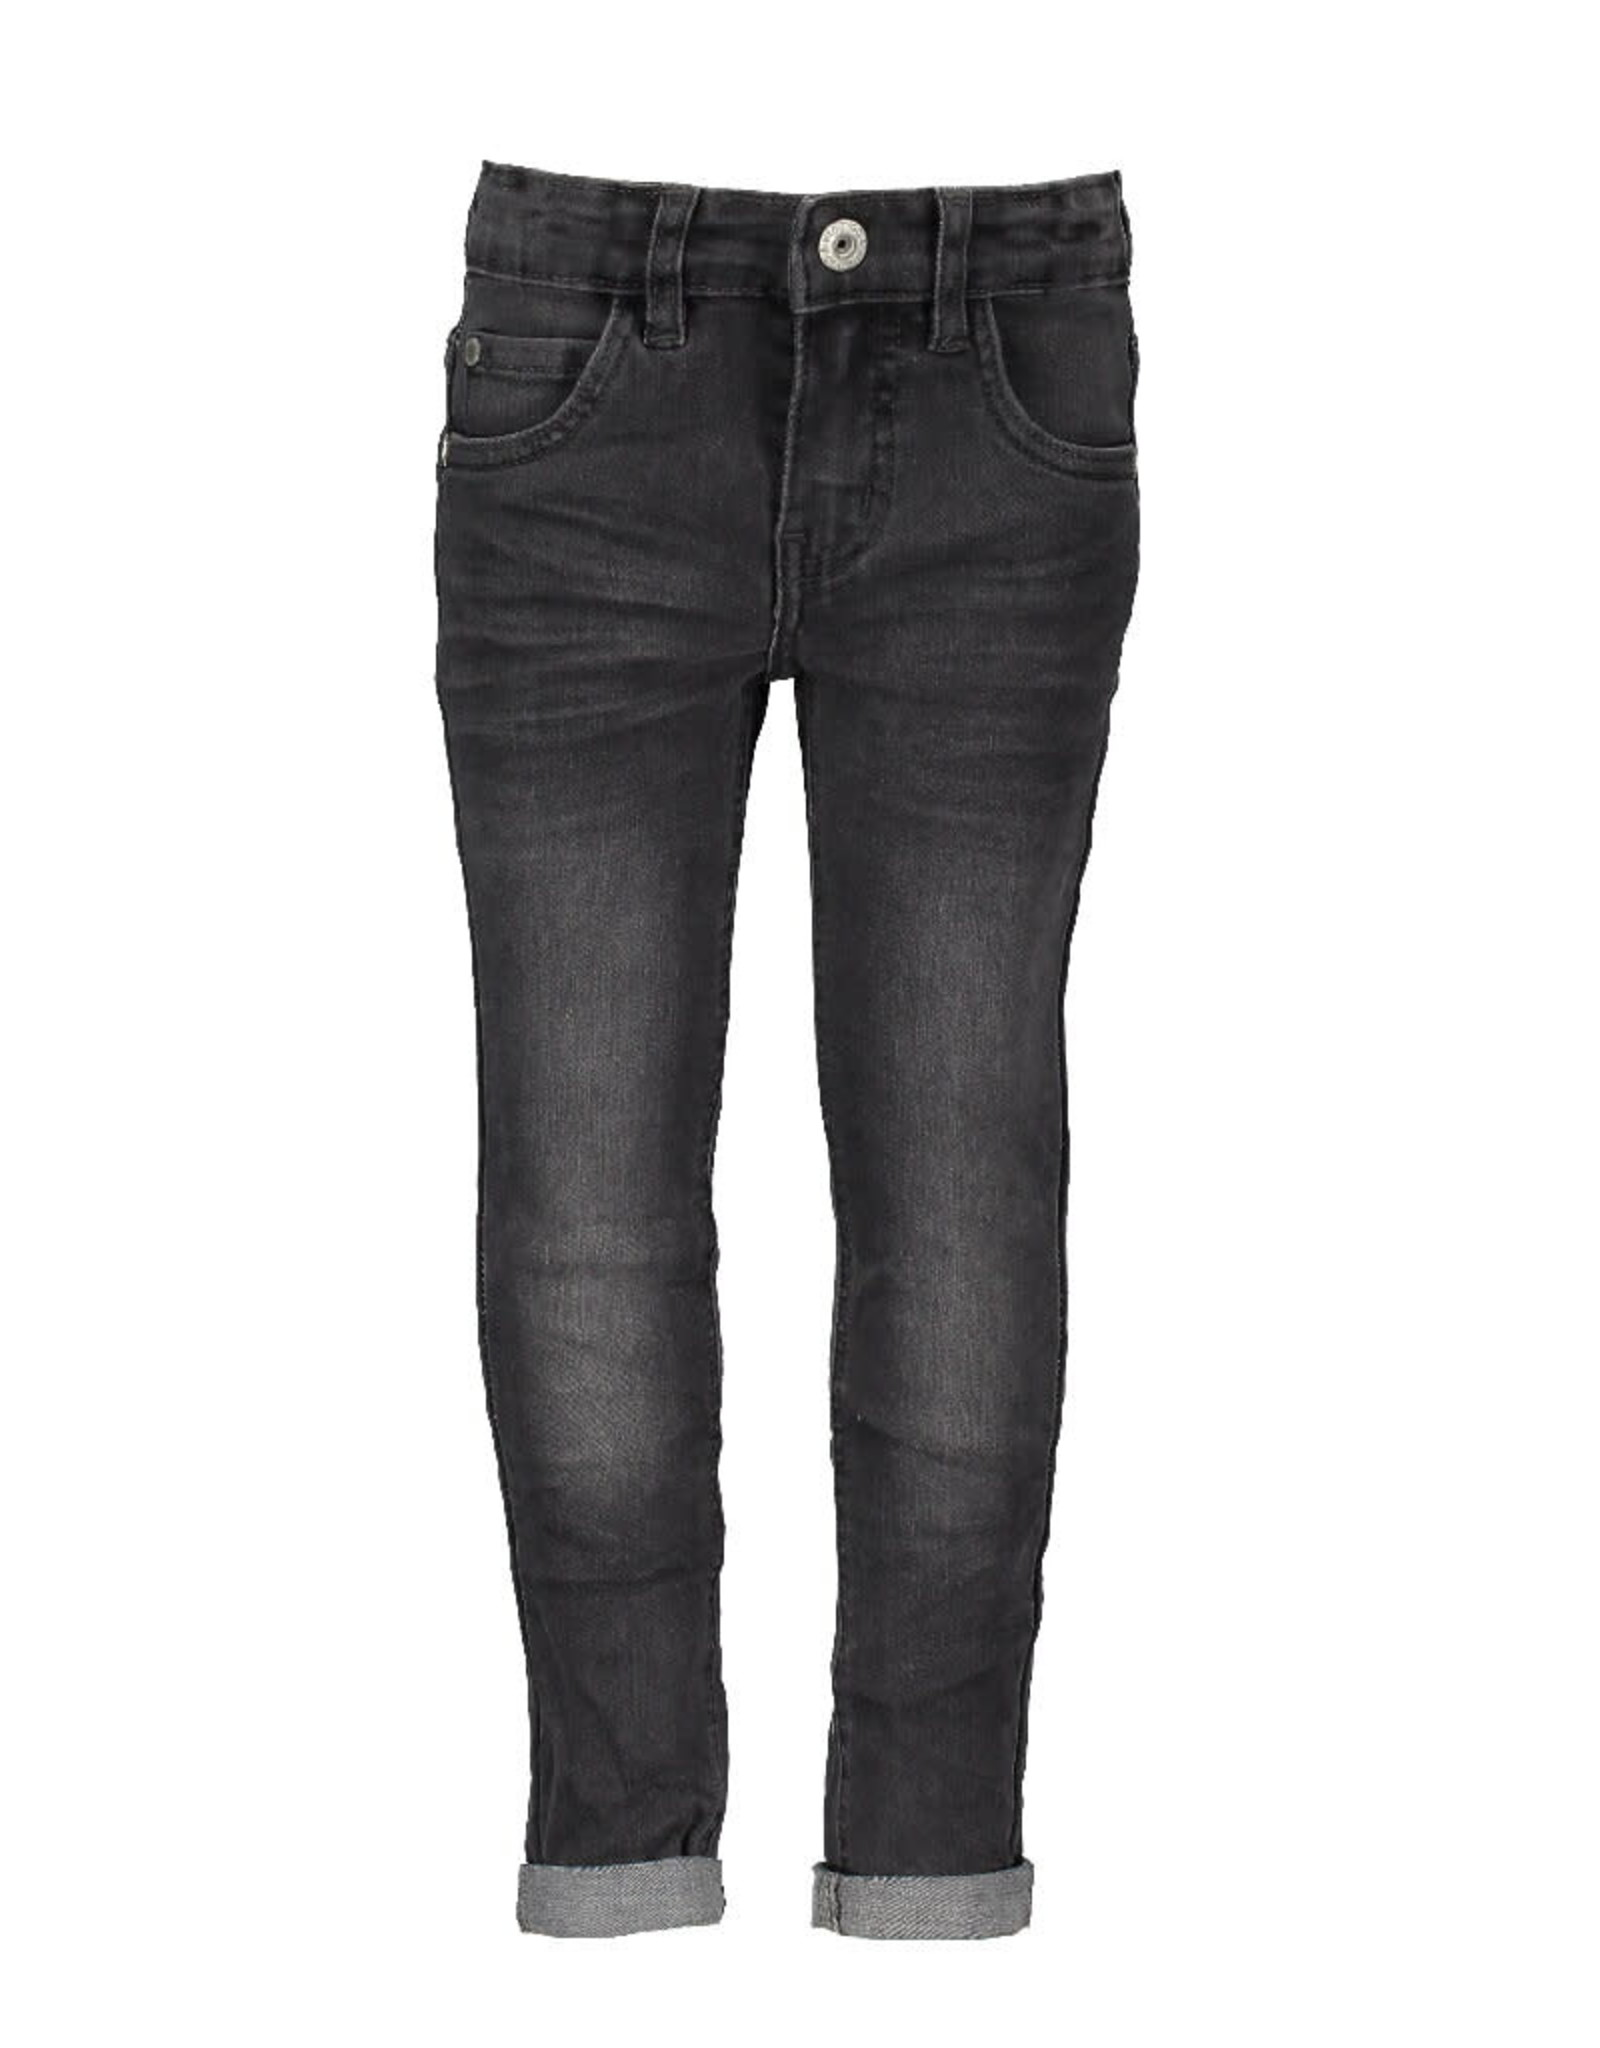 Tygo & vito Jeans 808 Black denim Skinny